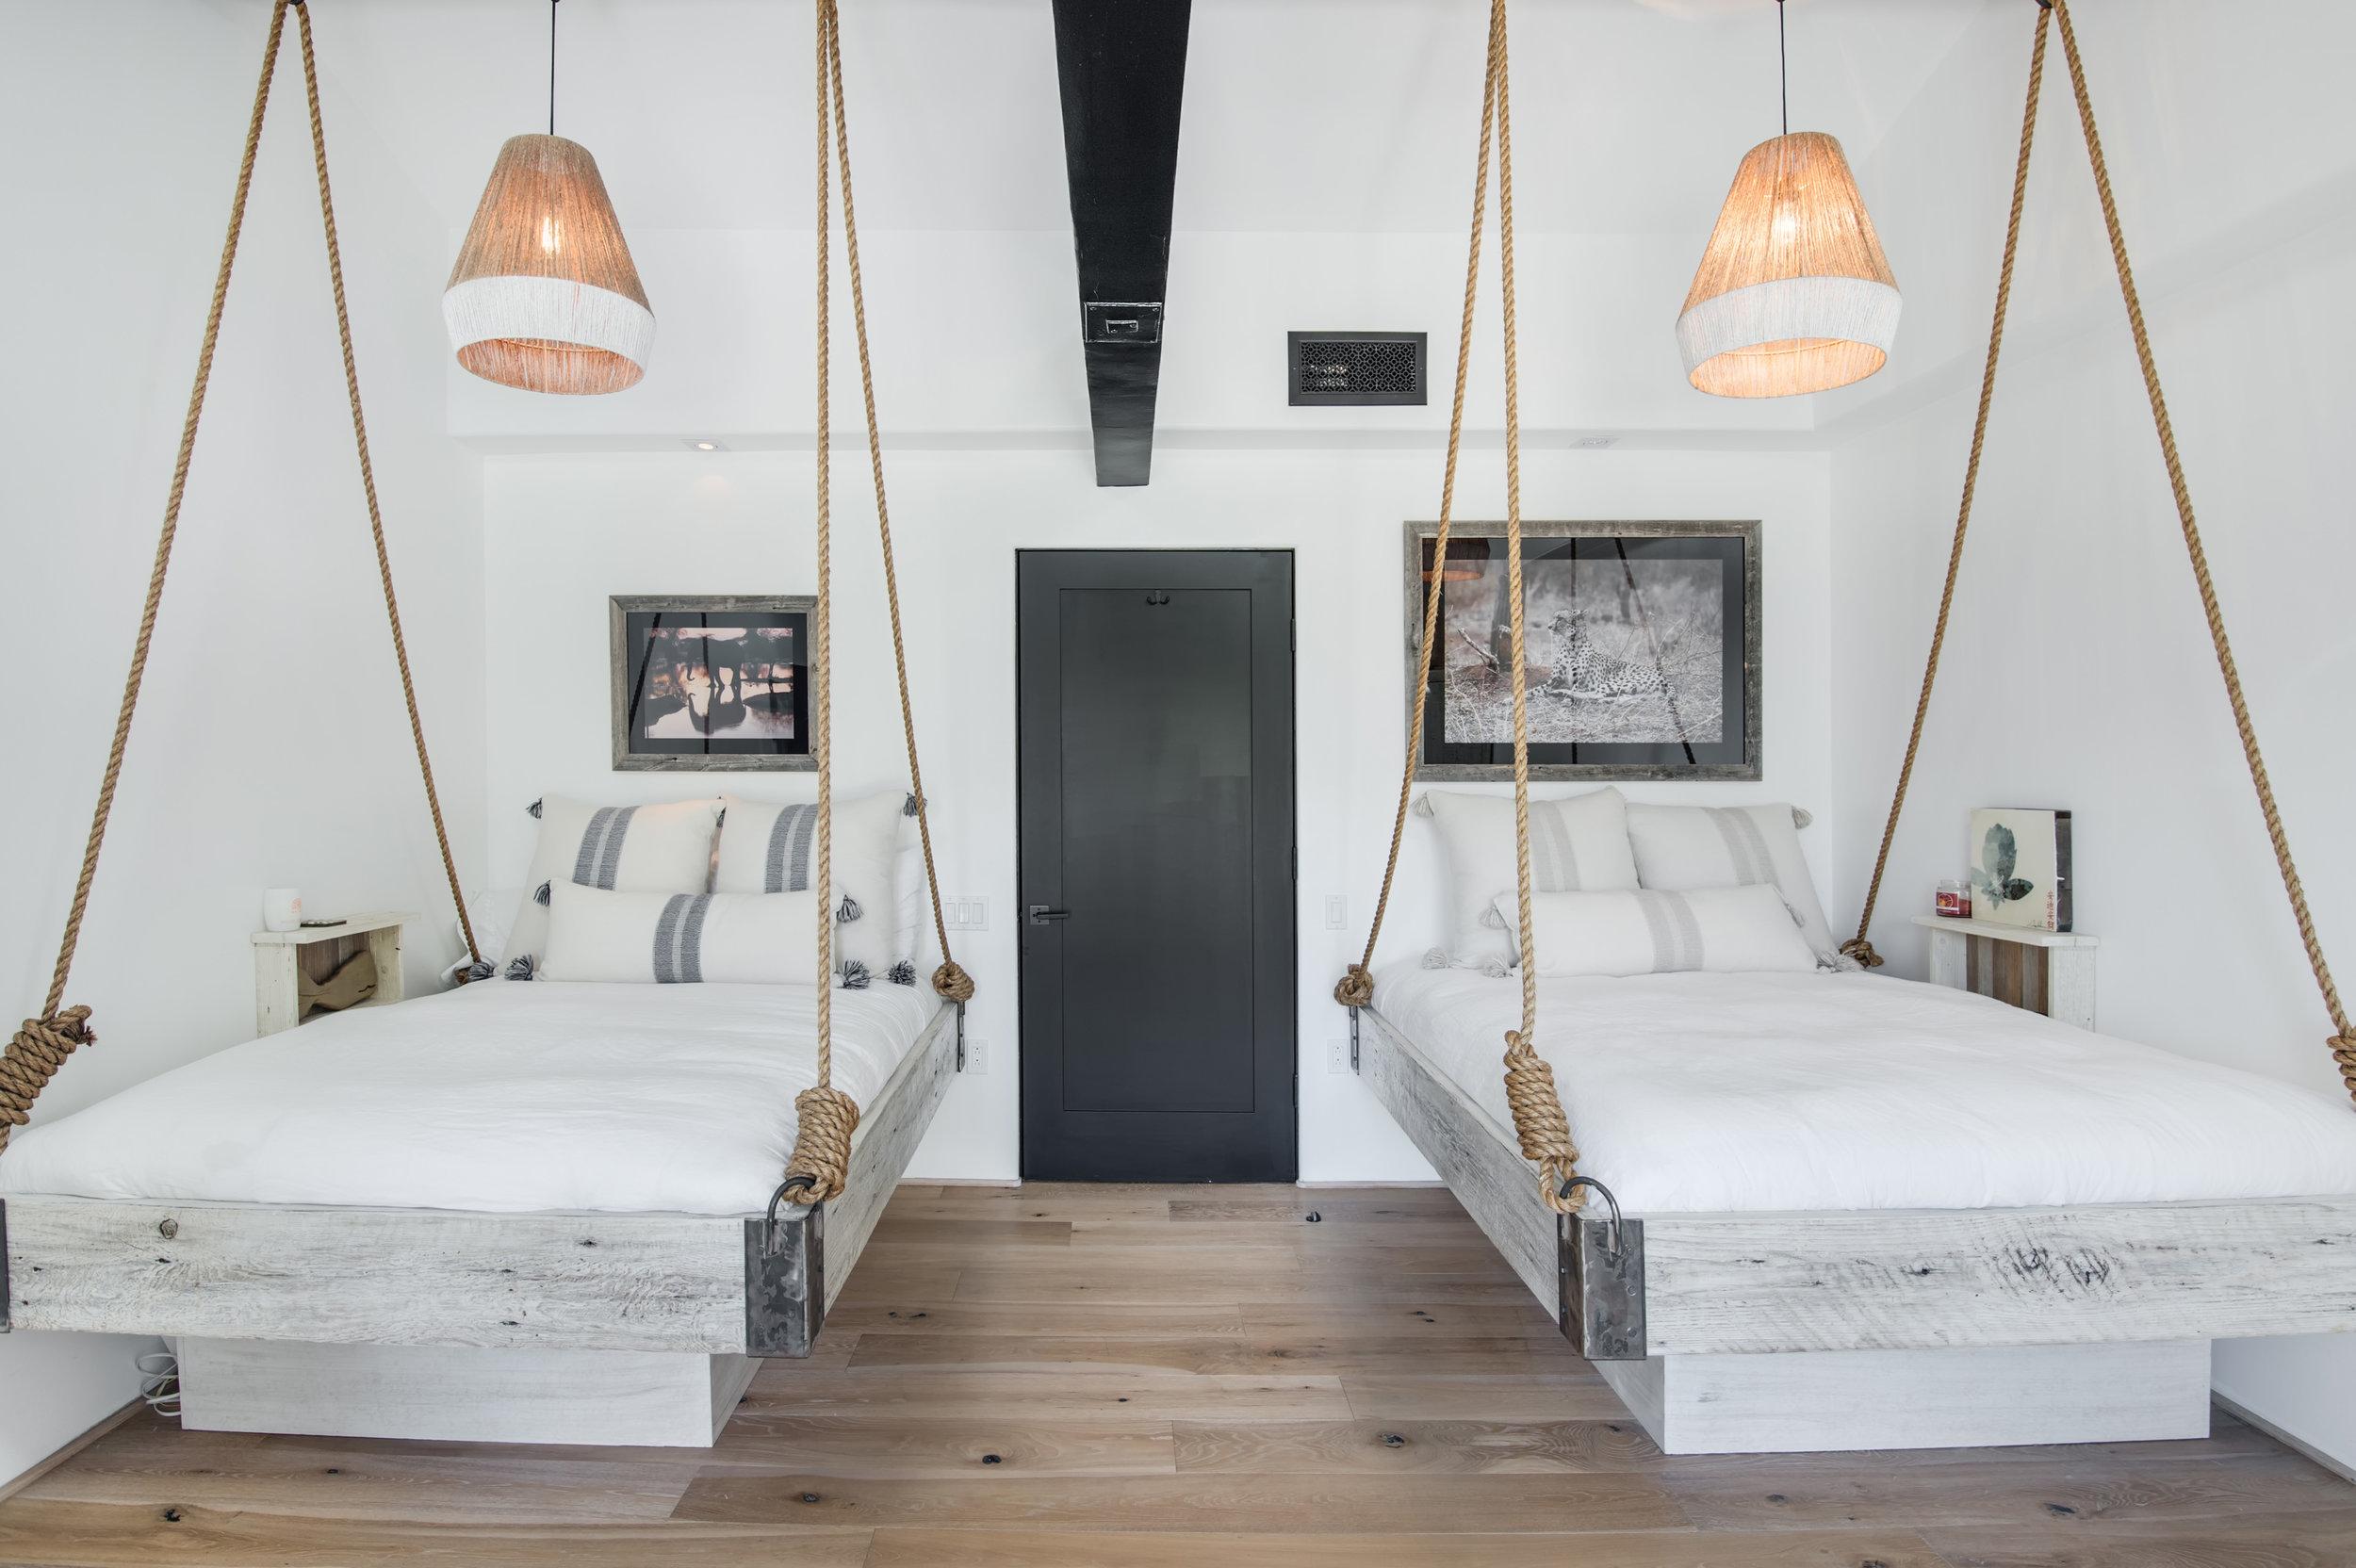 023 Bedroom 26272 Cool Glen Way Malibu For Sale Luxury Real Estate.jpg